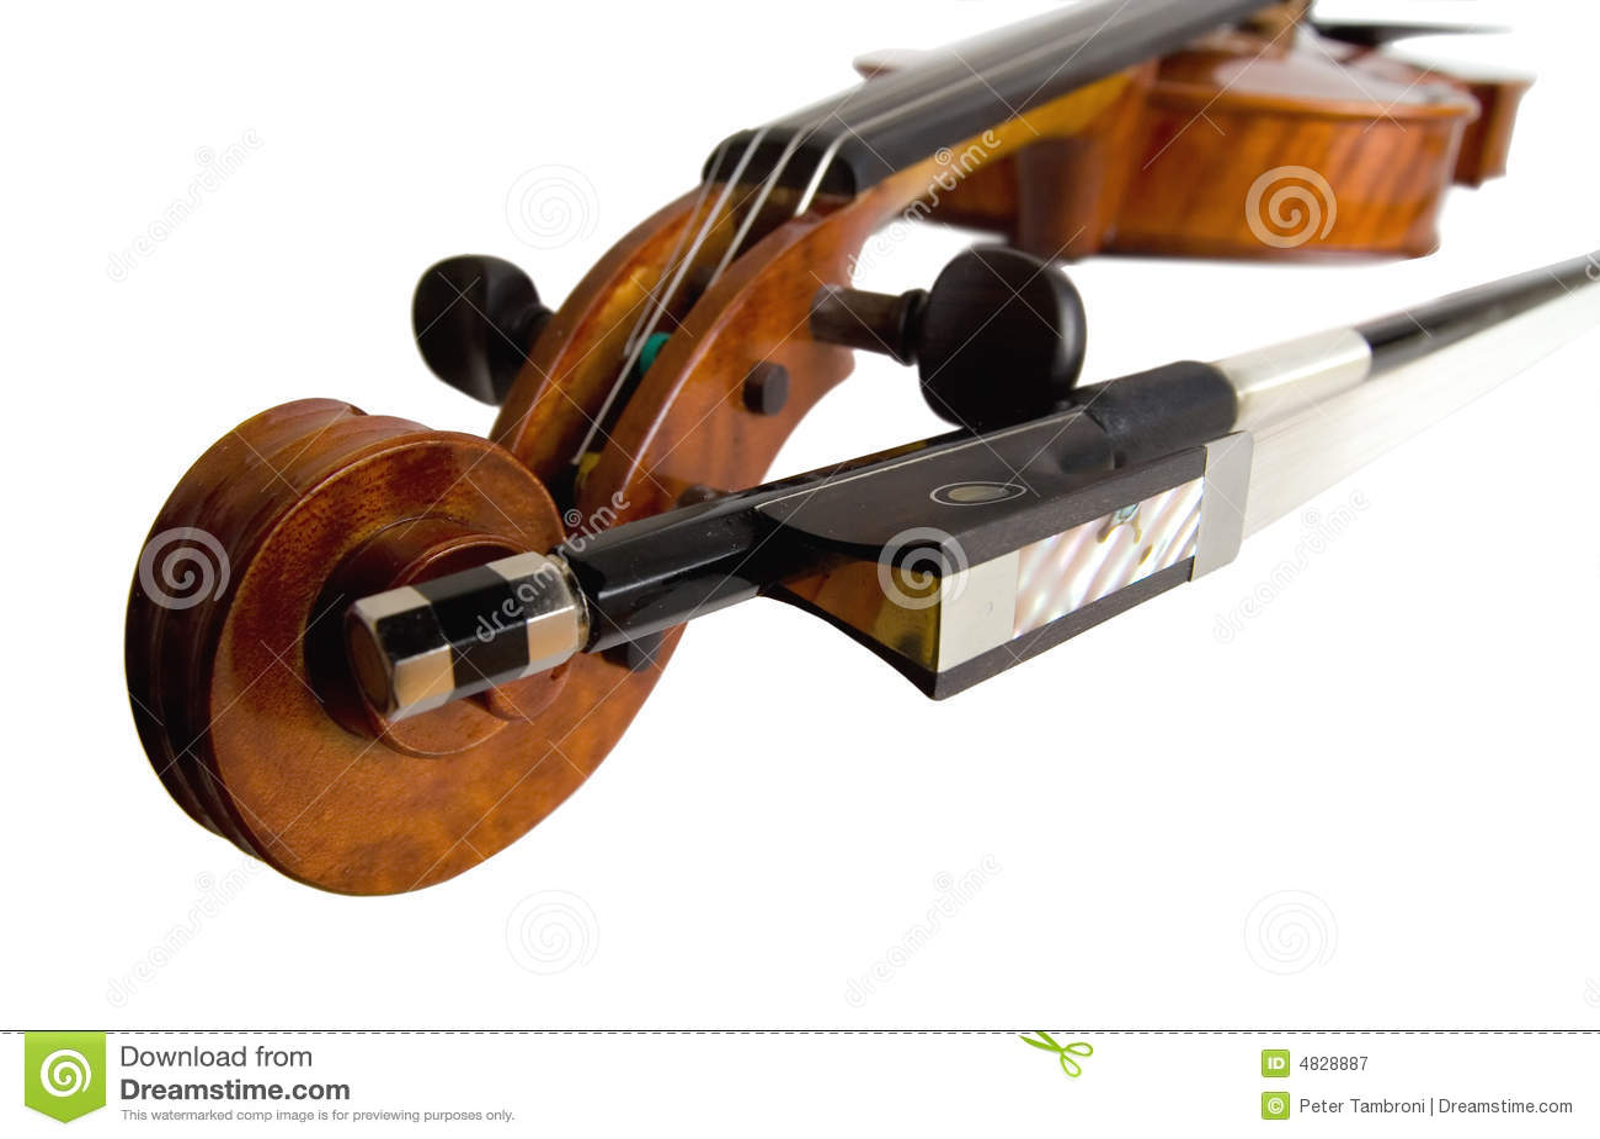 Ekstremalne skrzypce.